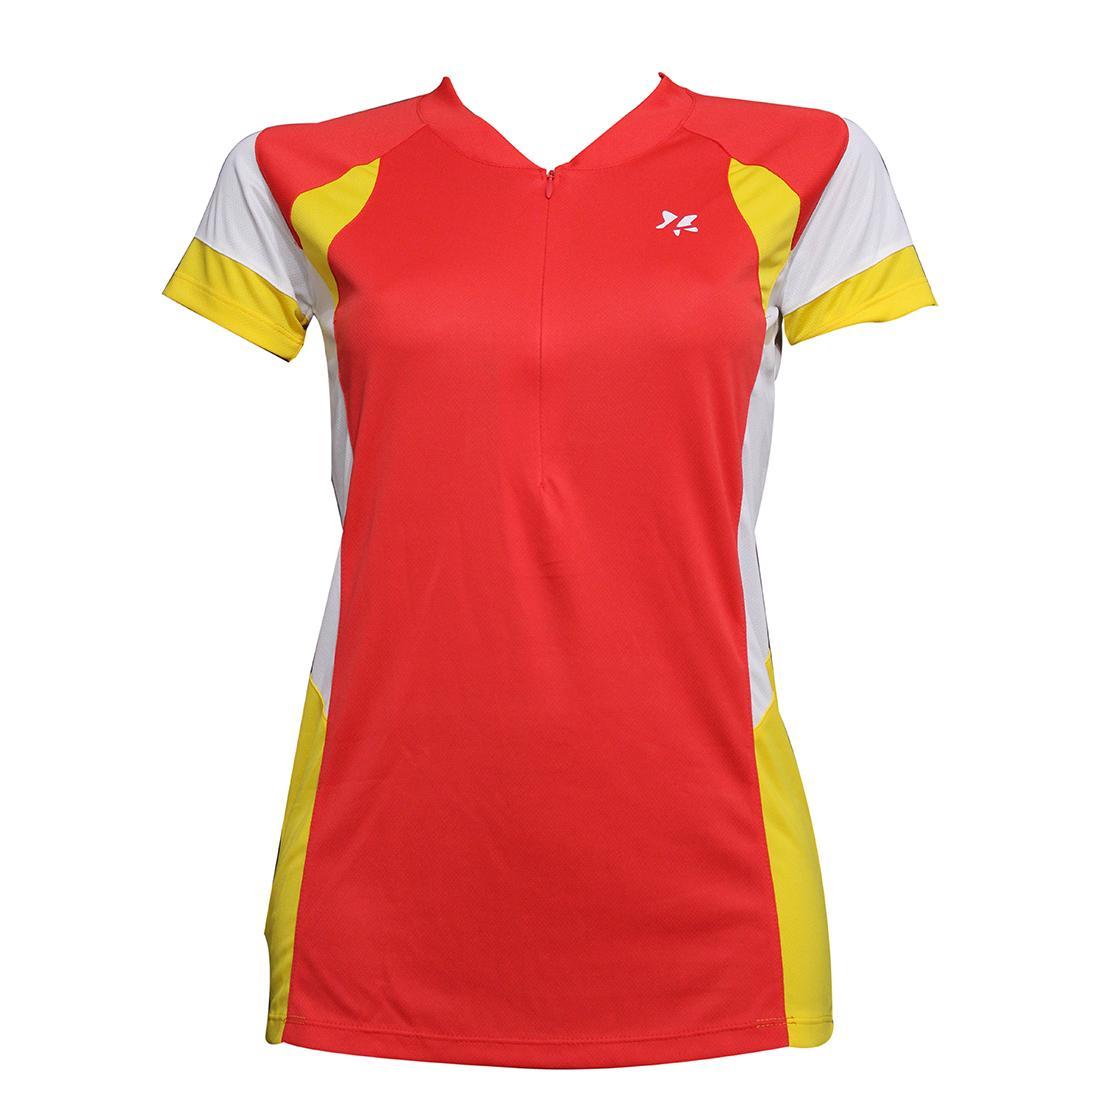 Fitur Paket Lasona Lengkap Dan Harga Terbaru Katalog Baju Atasan Panjang Senam Wanita Brp A3049 M Merah Kuning